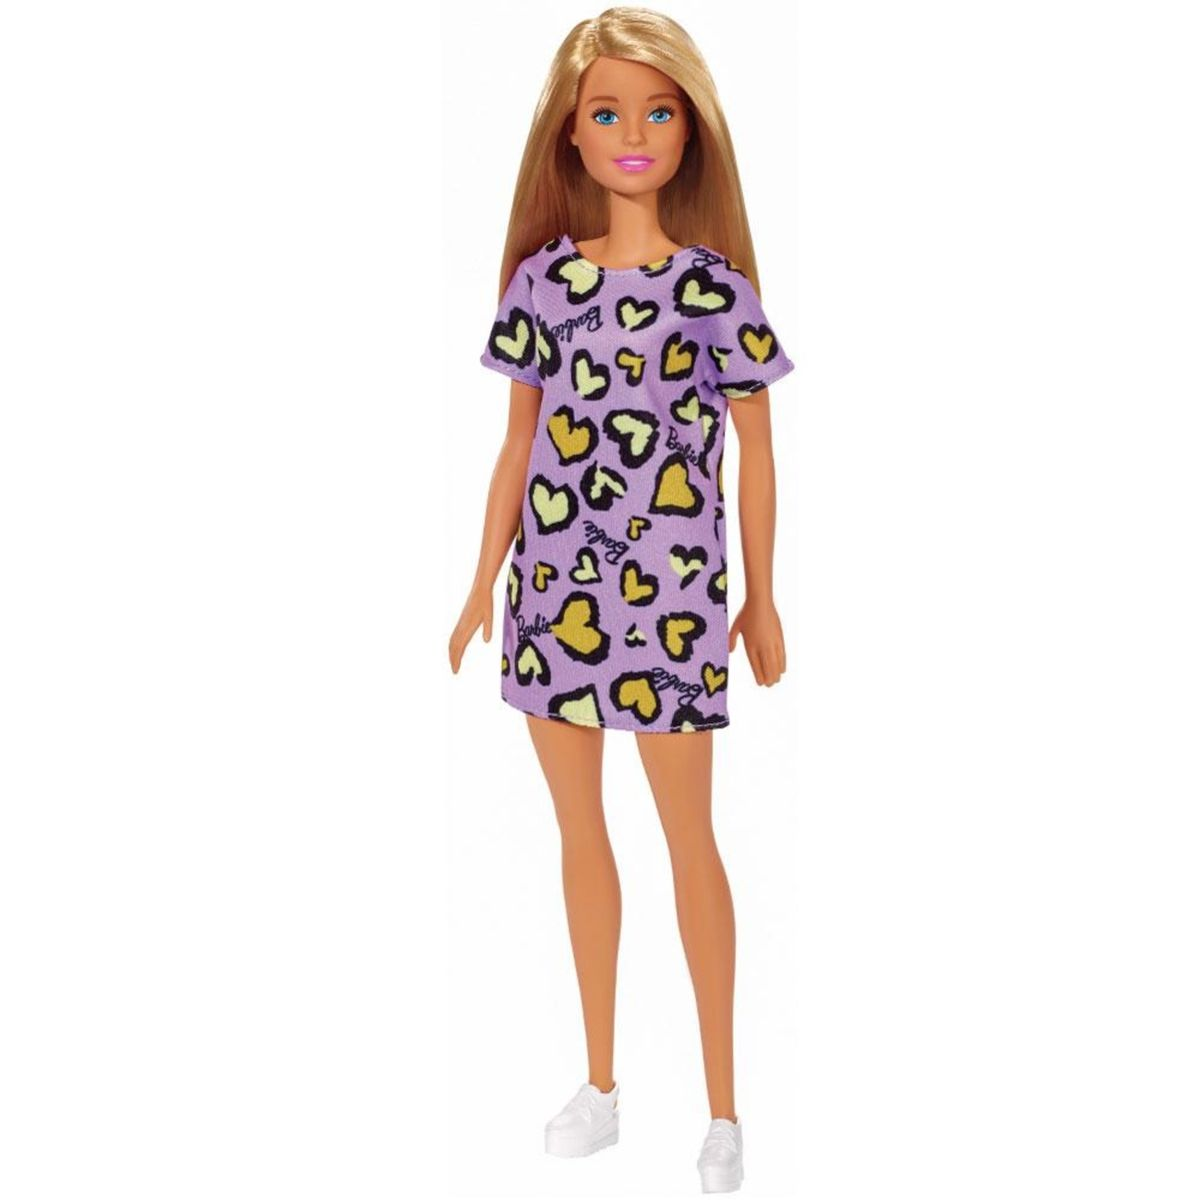 Boneca Barbie Fashion And Beauty Loira com Vestido Roxo - Mattel